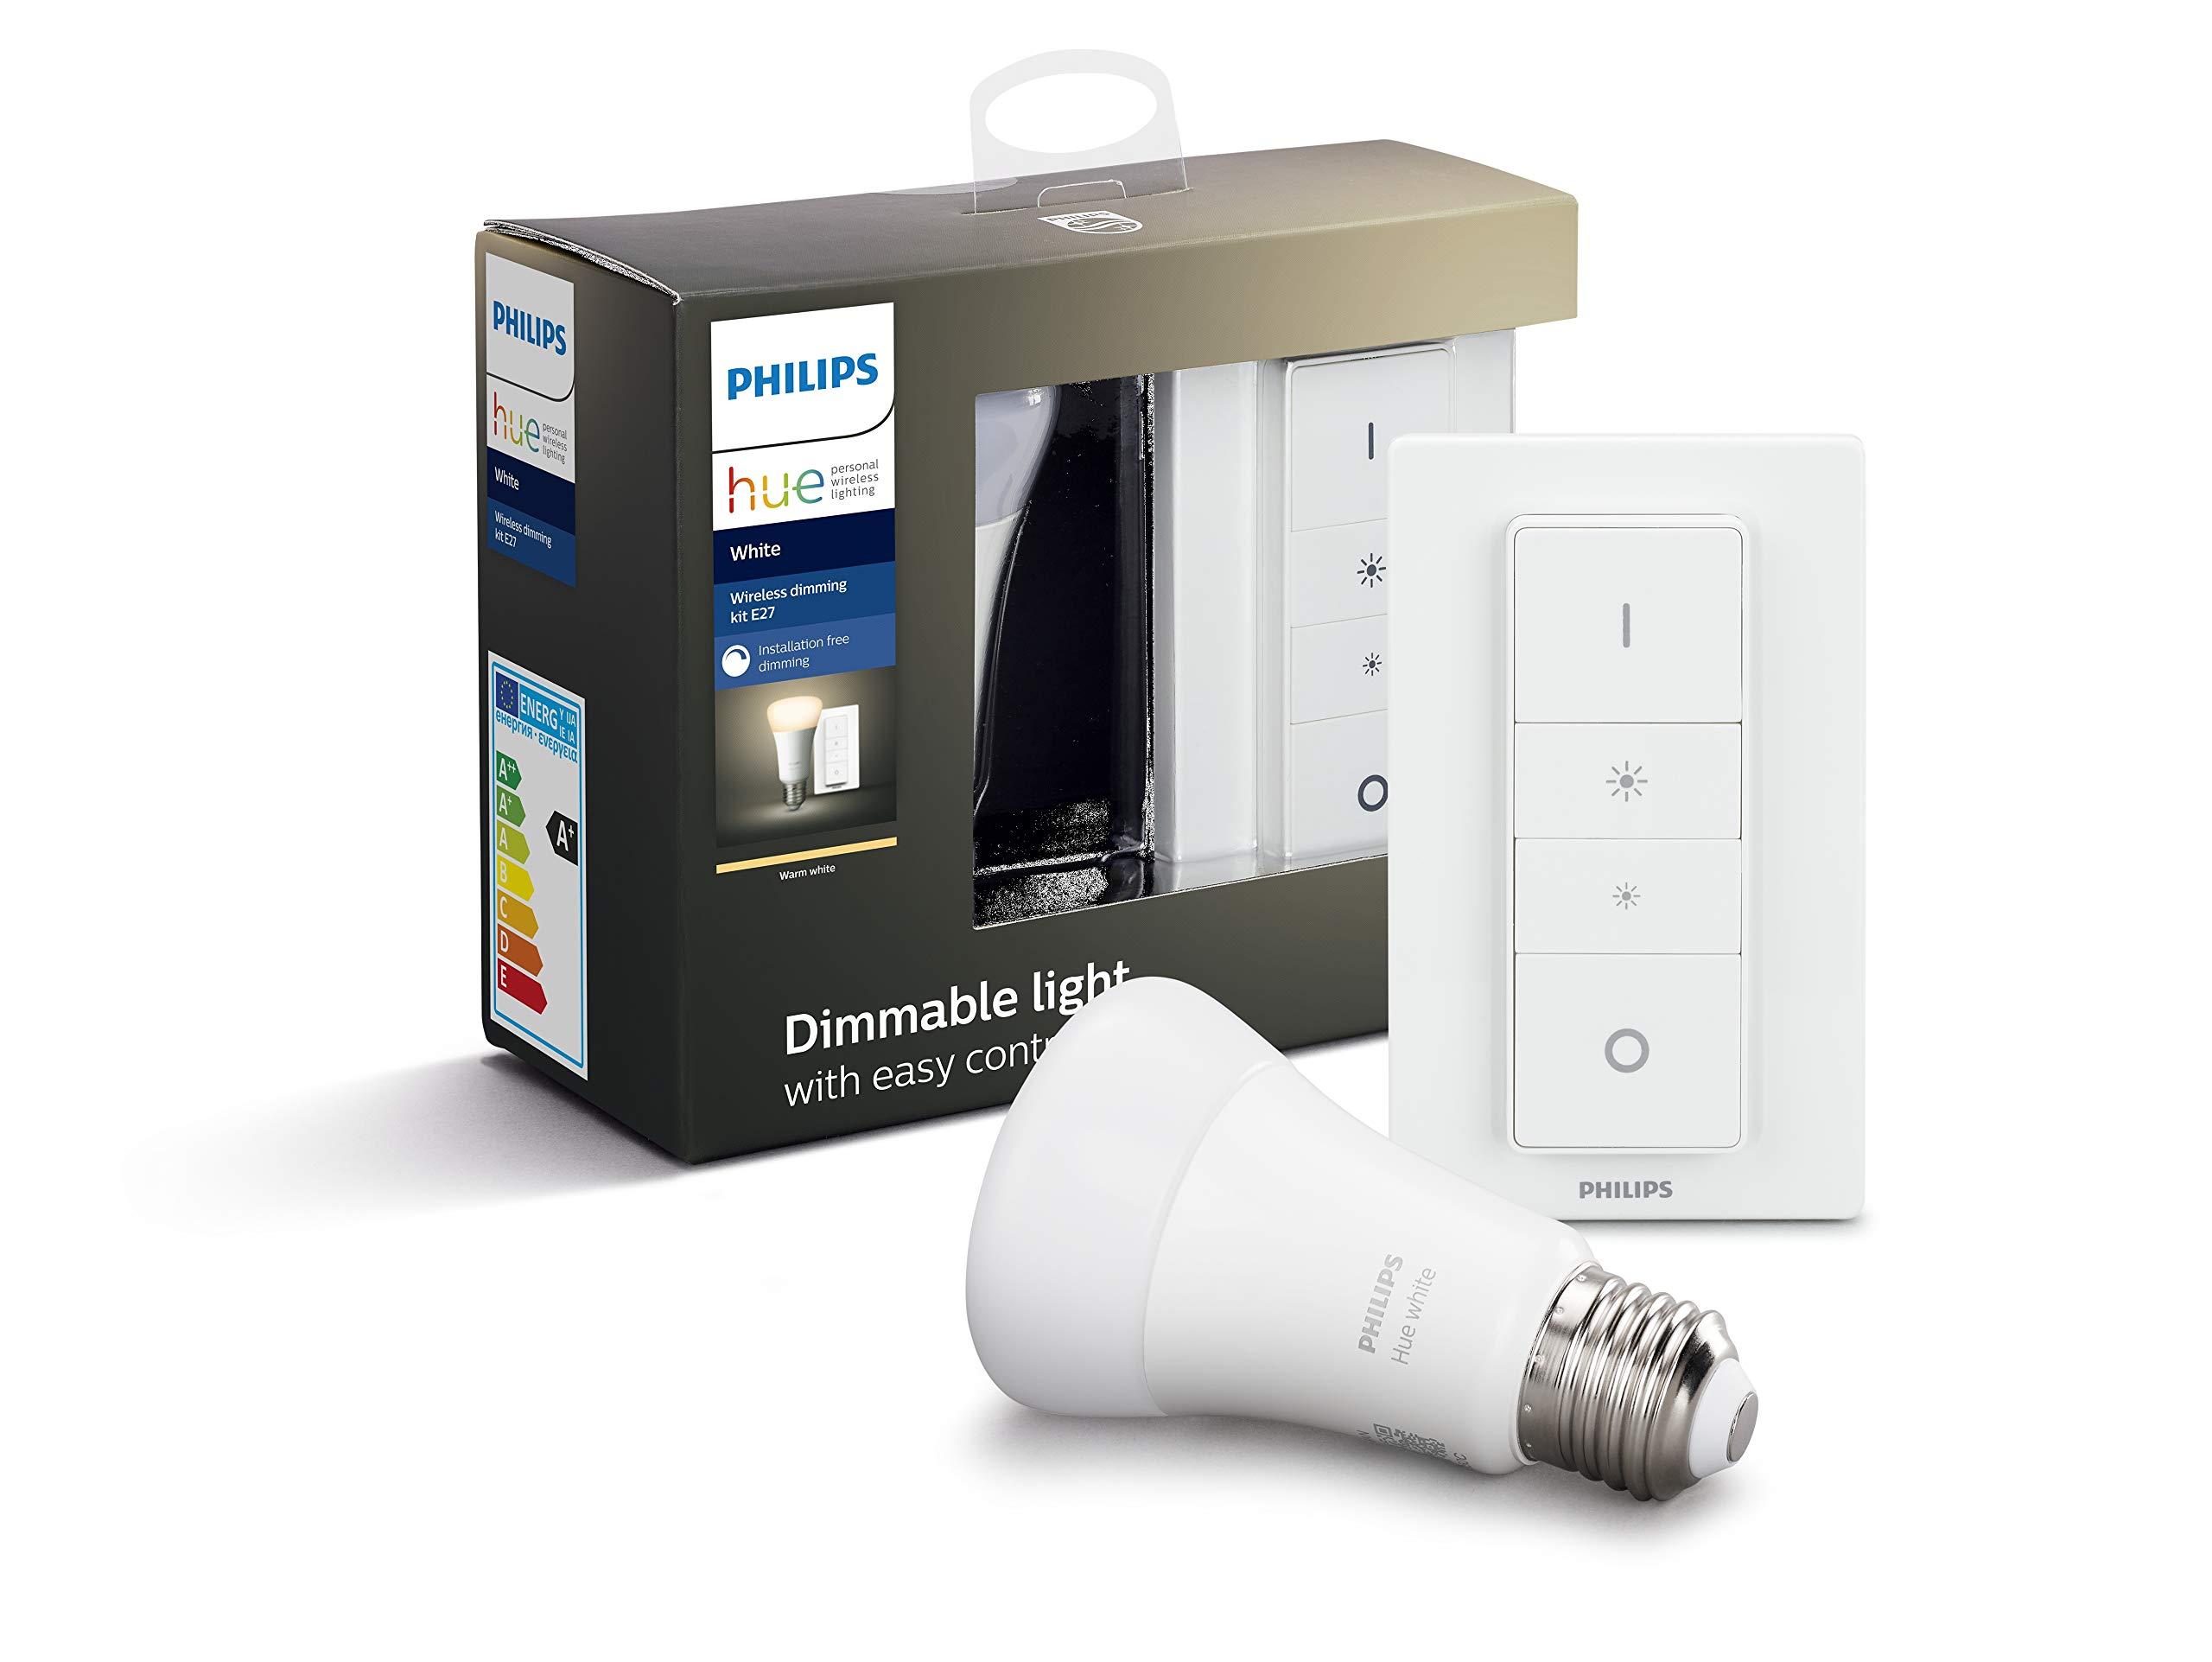 Philips Hue Bombilla Inteligente LED E27 con Mando Inalámbrico, con Bluetooth, Luz Blanca Cálida, Compatible con Alexa y Google Home